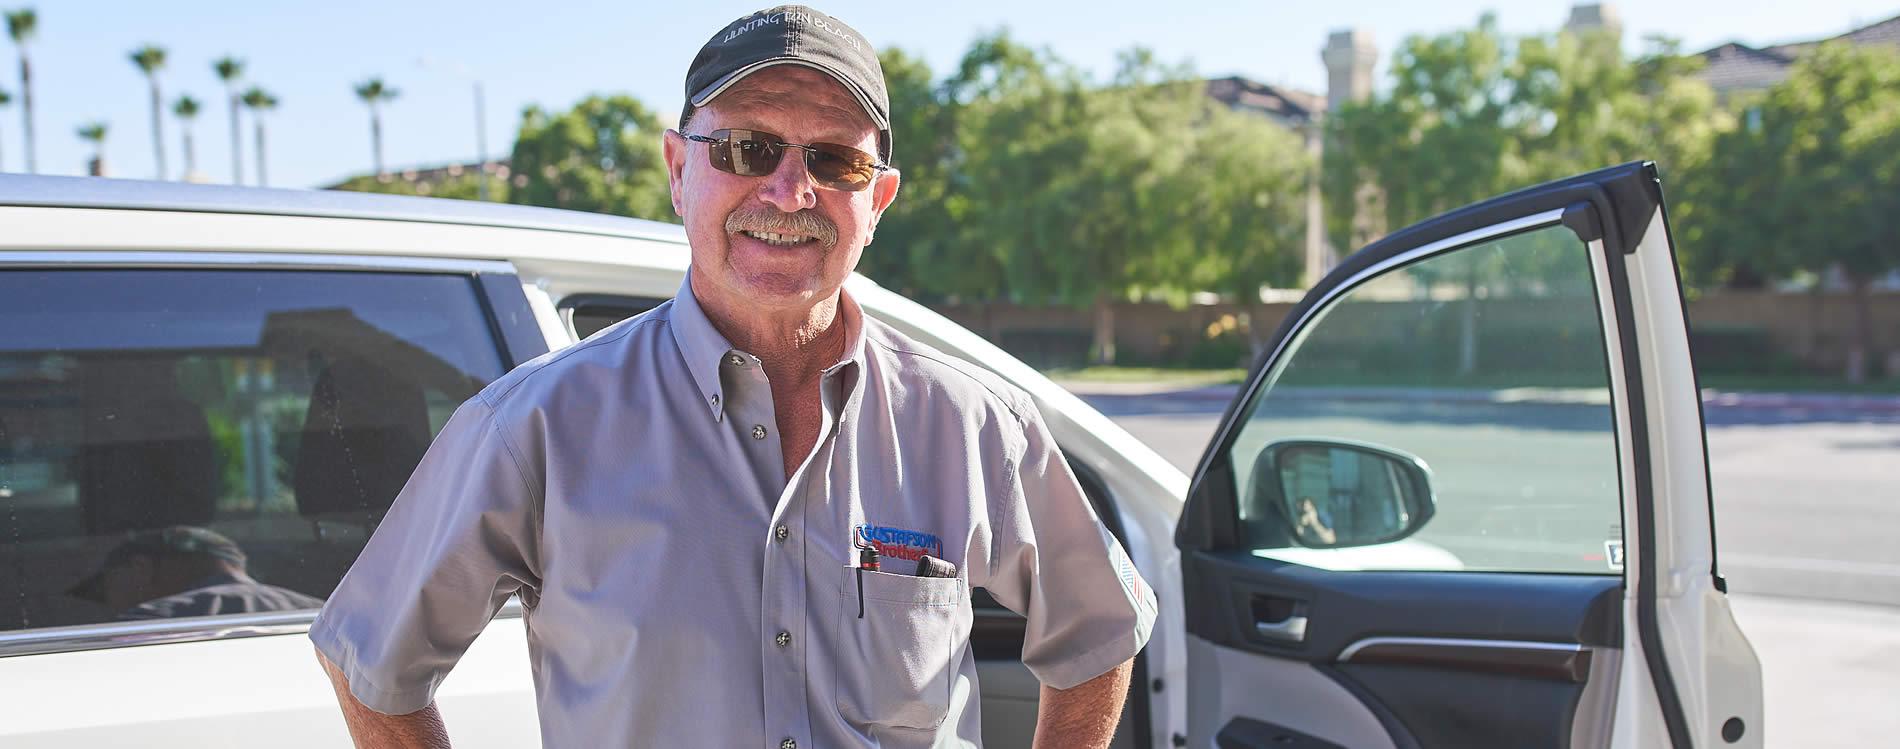 gustafson bros auto mechanic shop employee